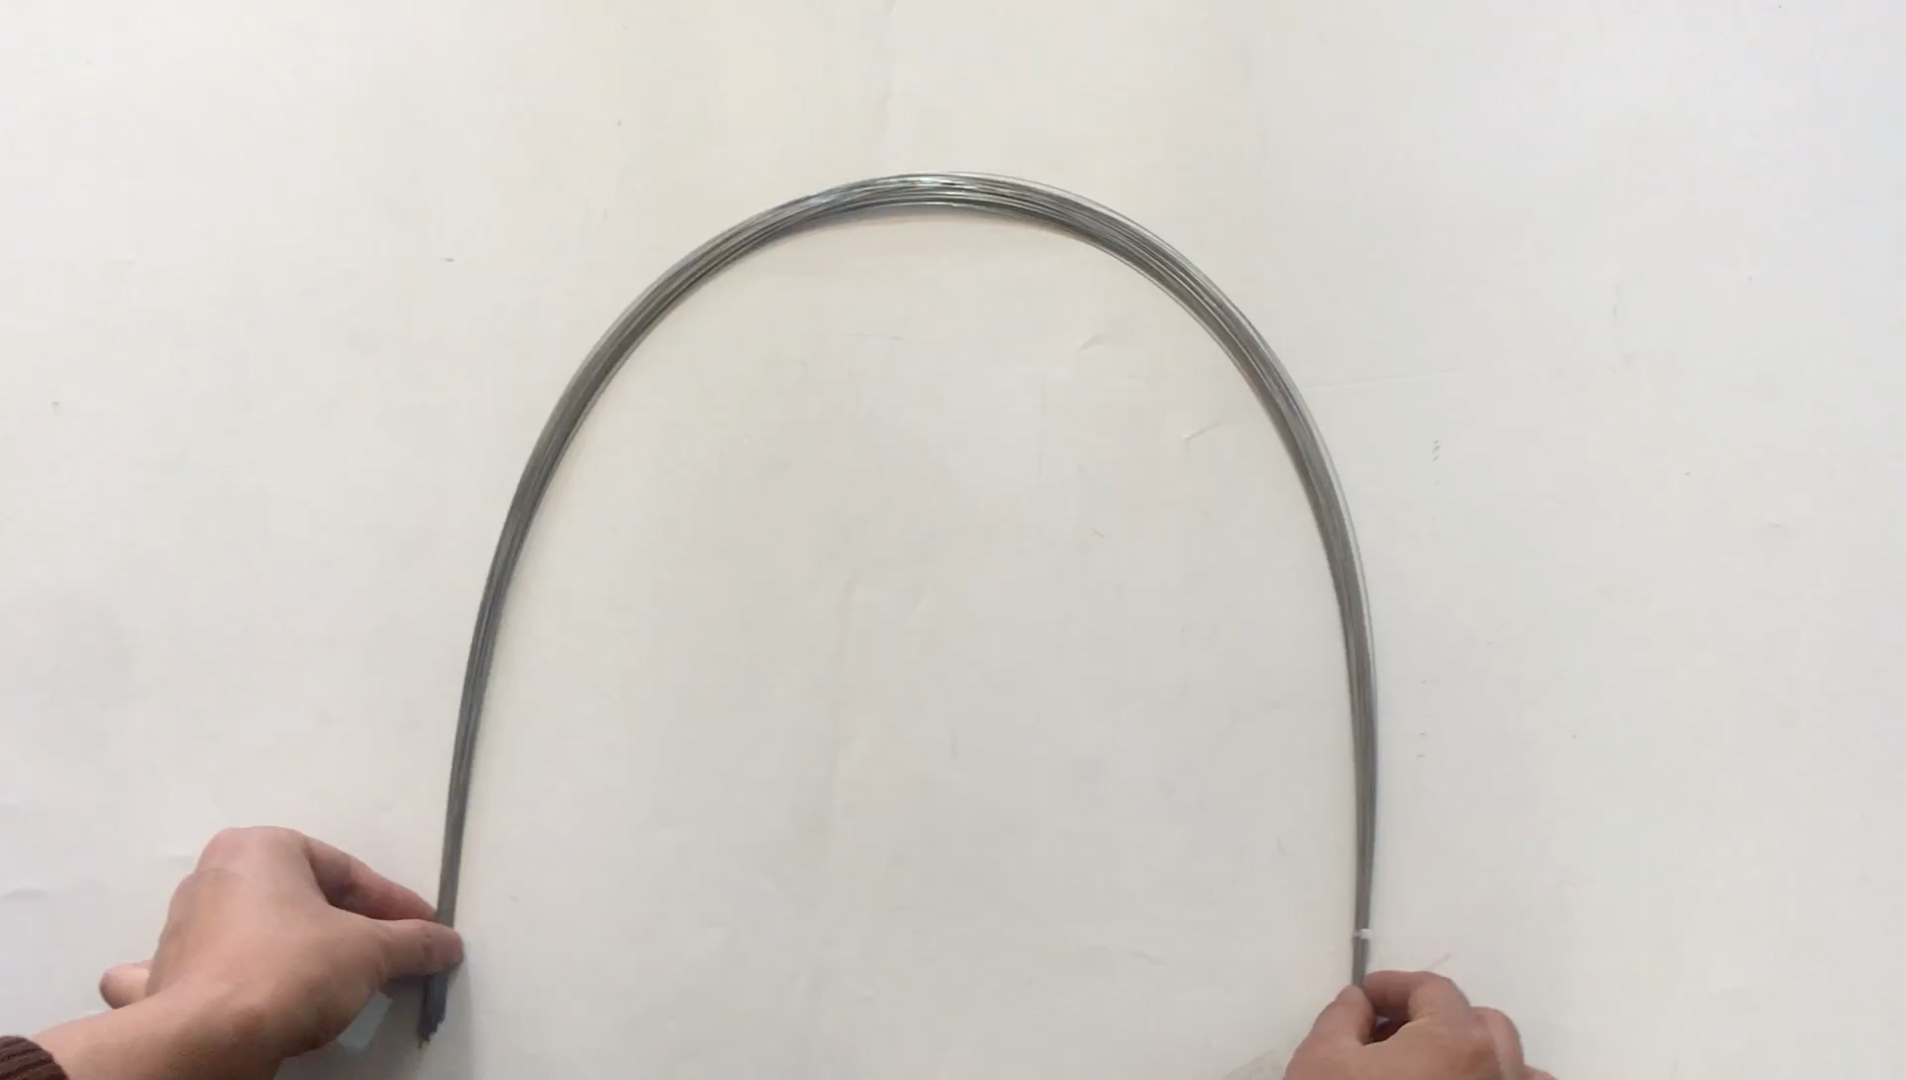 Superelastic Polished Nitinol Wire 2mm - Buy Nitinol Wire ...